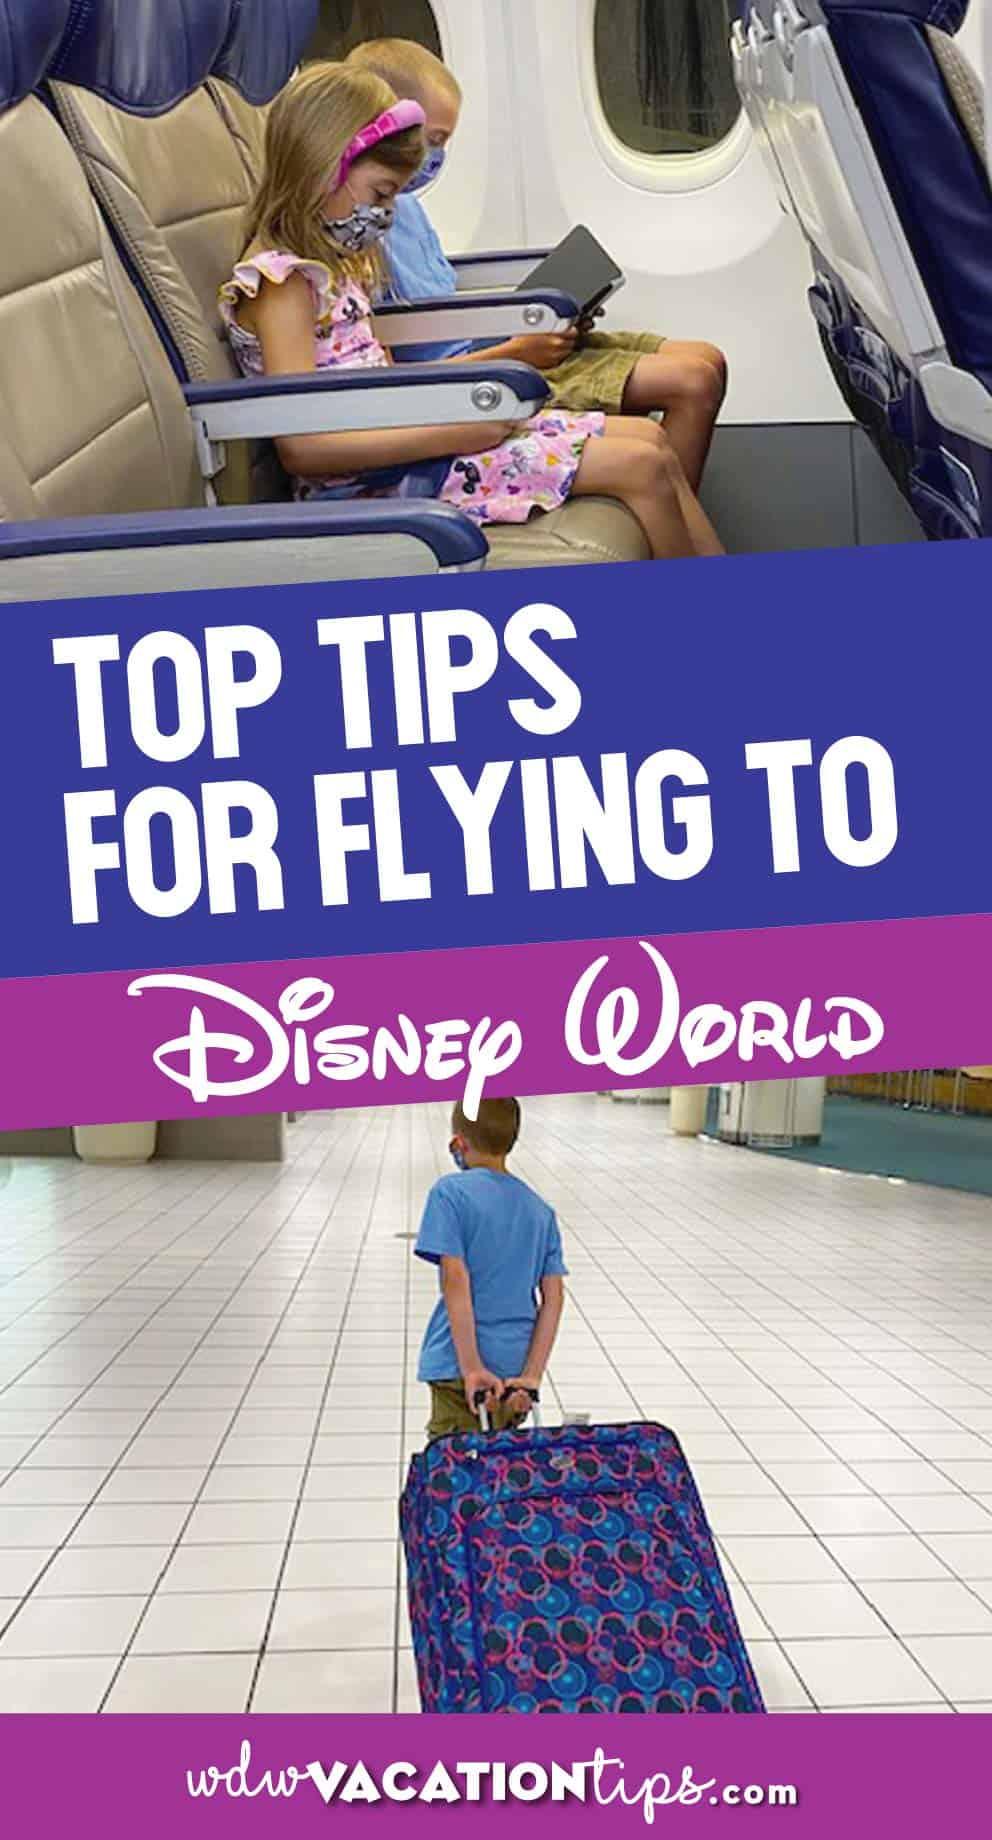 Tips for flying to disney world